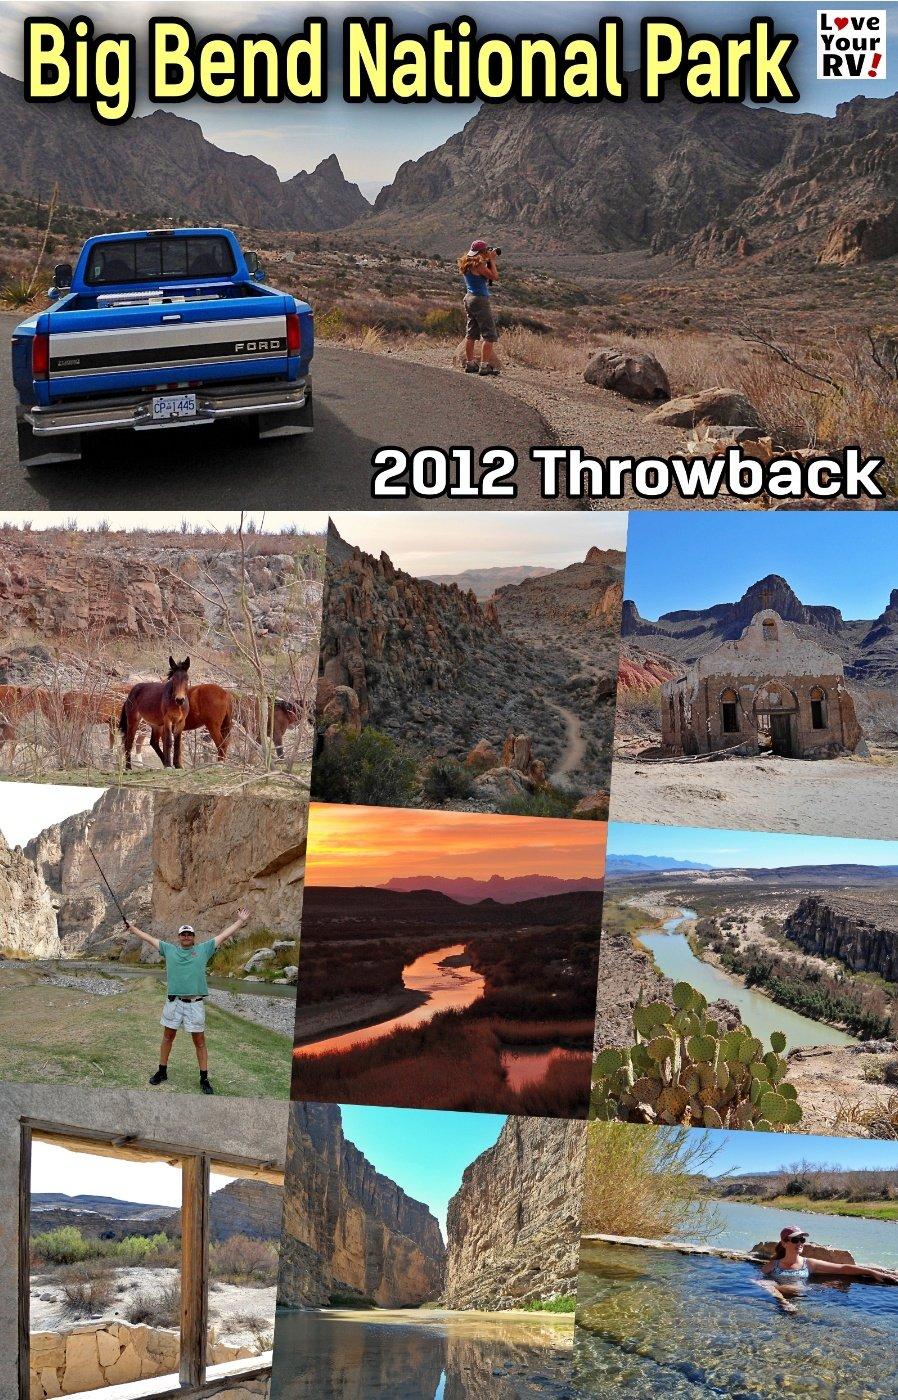 Visit to Big Bend National Park in March 2012 - LYRV Throwback Video